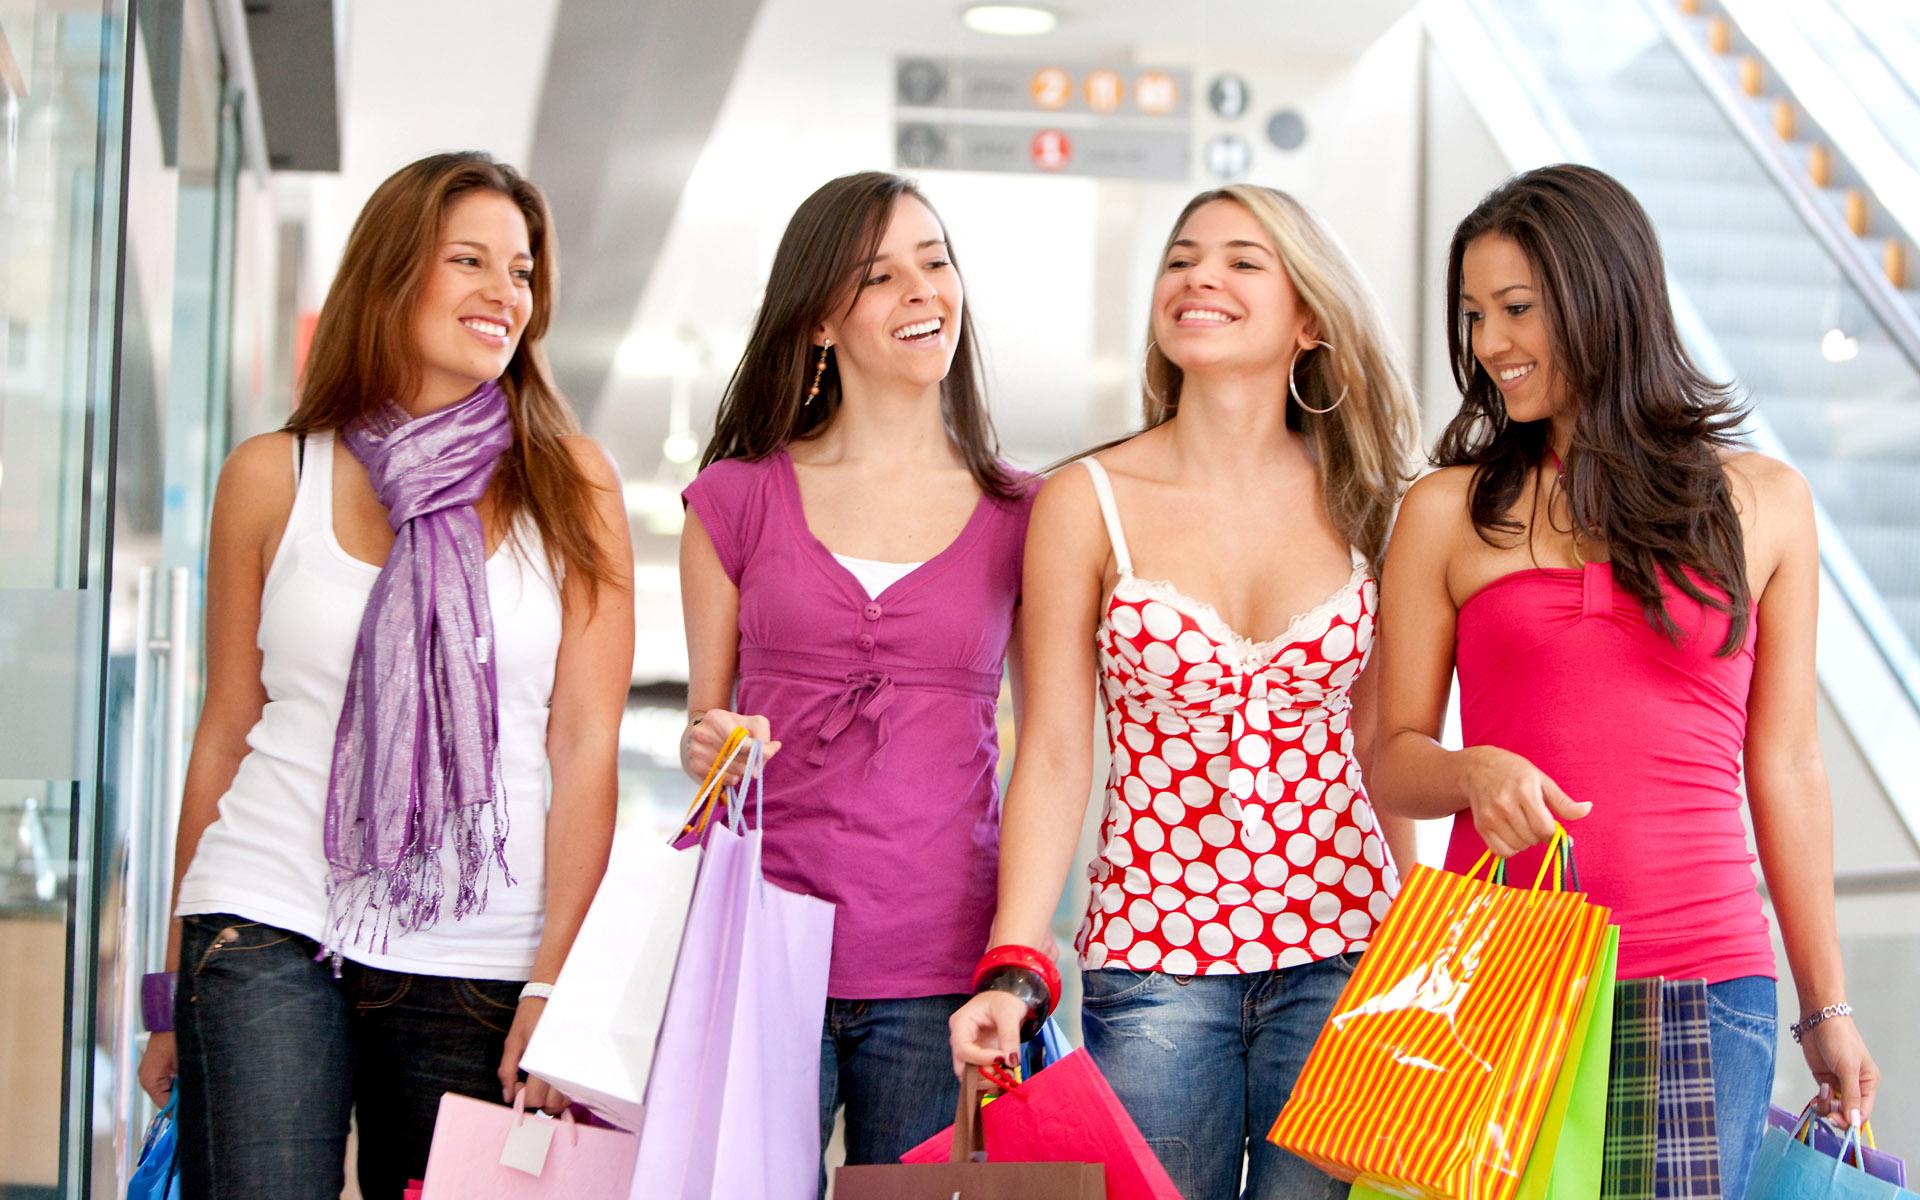 friends shopping